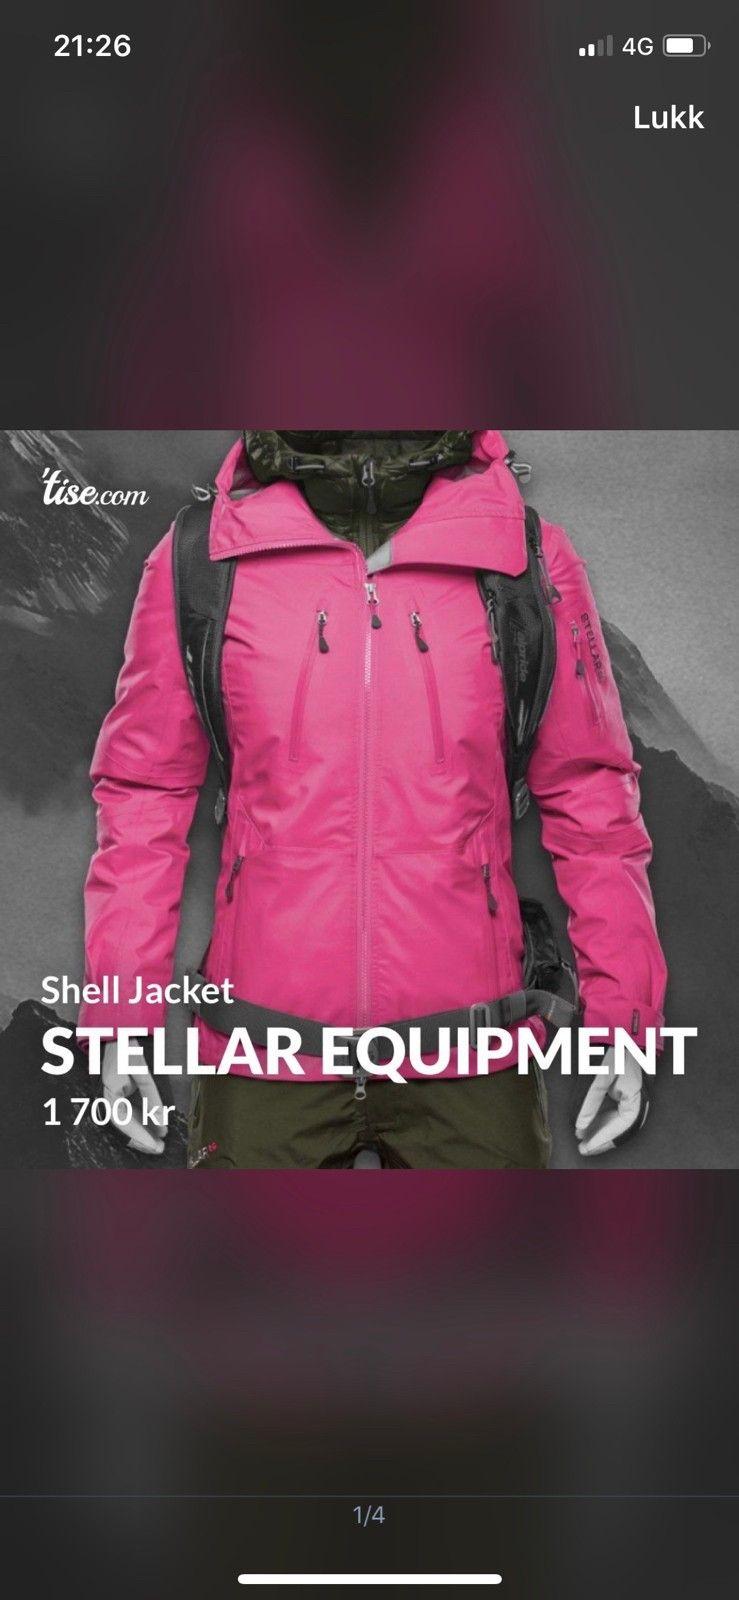 Stellar Equipment W Stellar Shell Pants | FINN.no